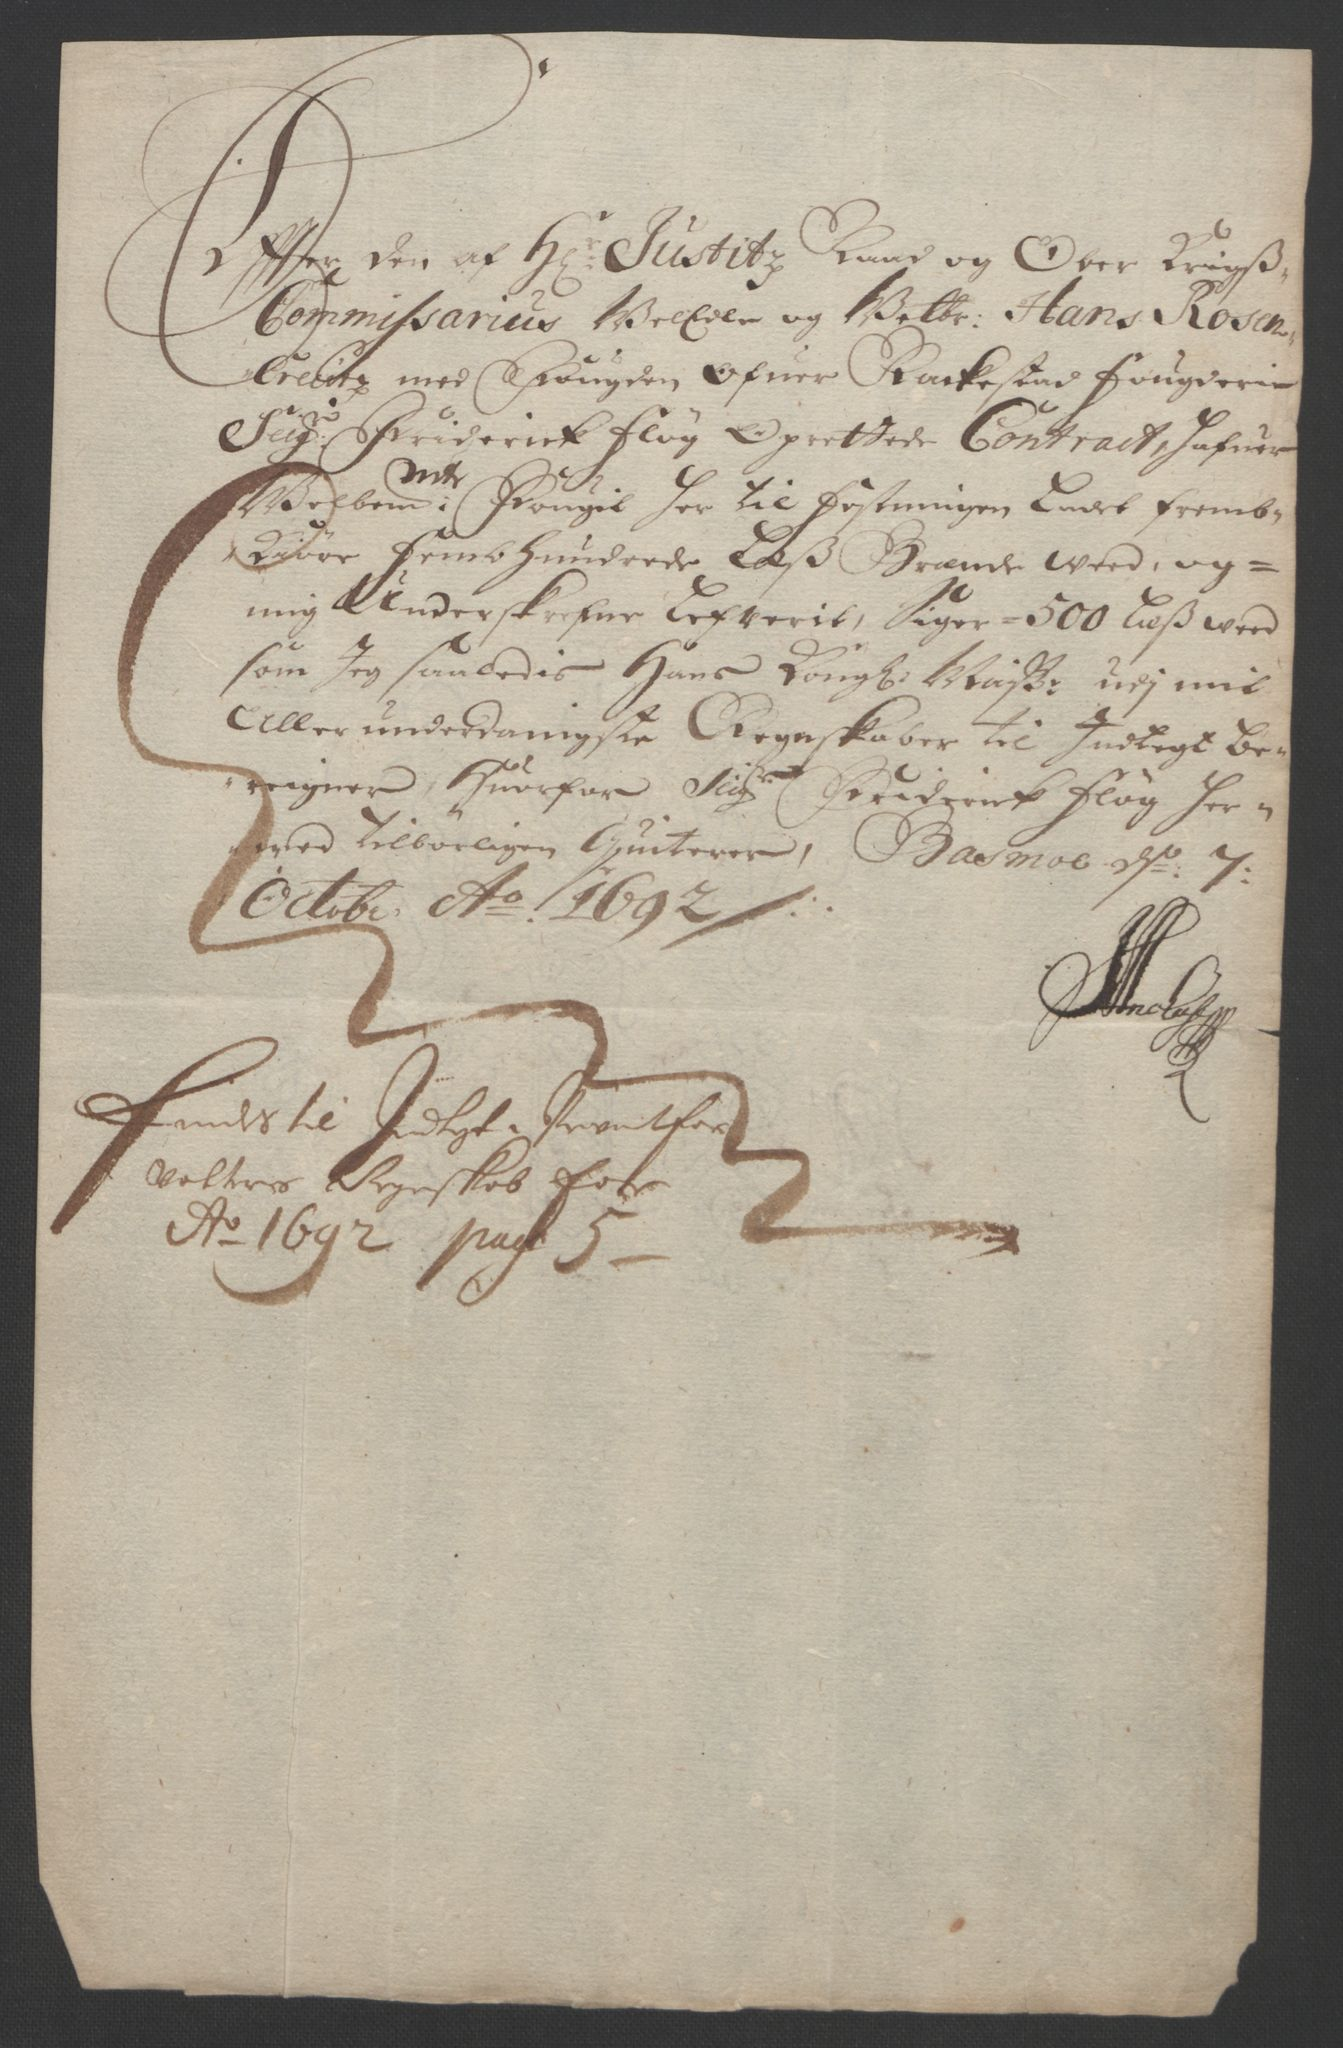 RA, Rentekammeret inntil 1814, Reviderte regnskaper, Fogderegnskap, R05/L0278: Fogderegnskap Rakkestad, 1691-1693, s. 340